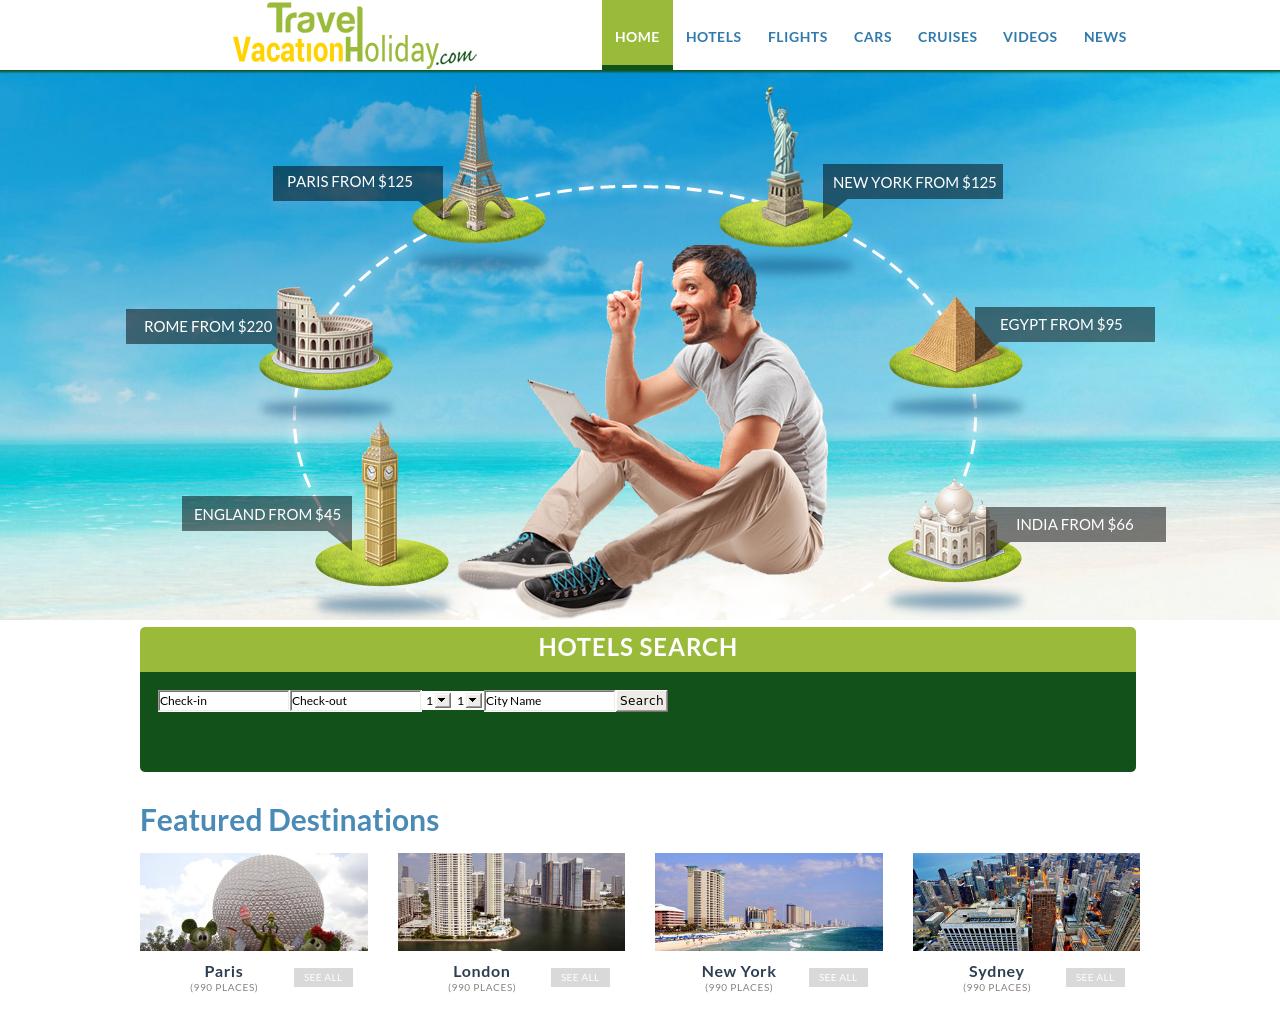 Travel-Vacation-Holiday-Advertising-Reviews-Pricing